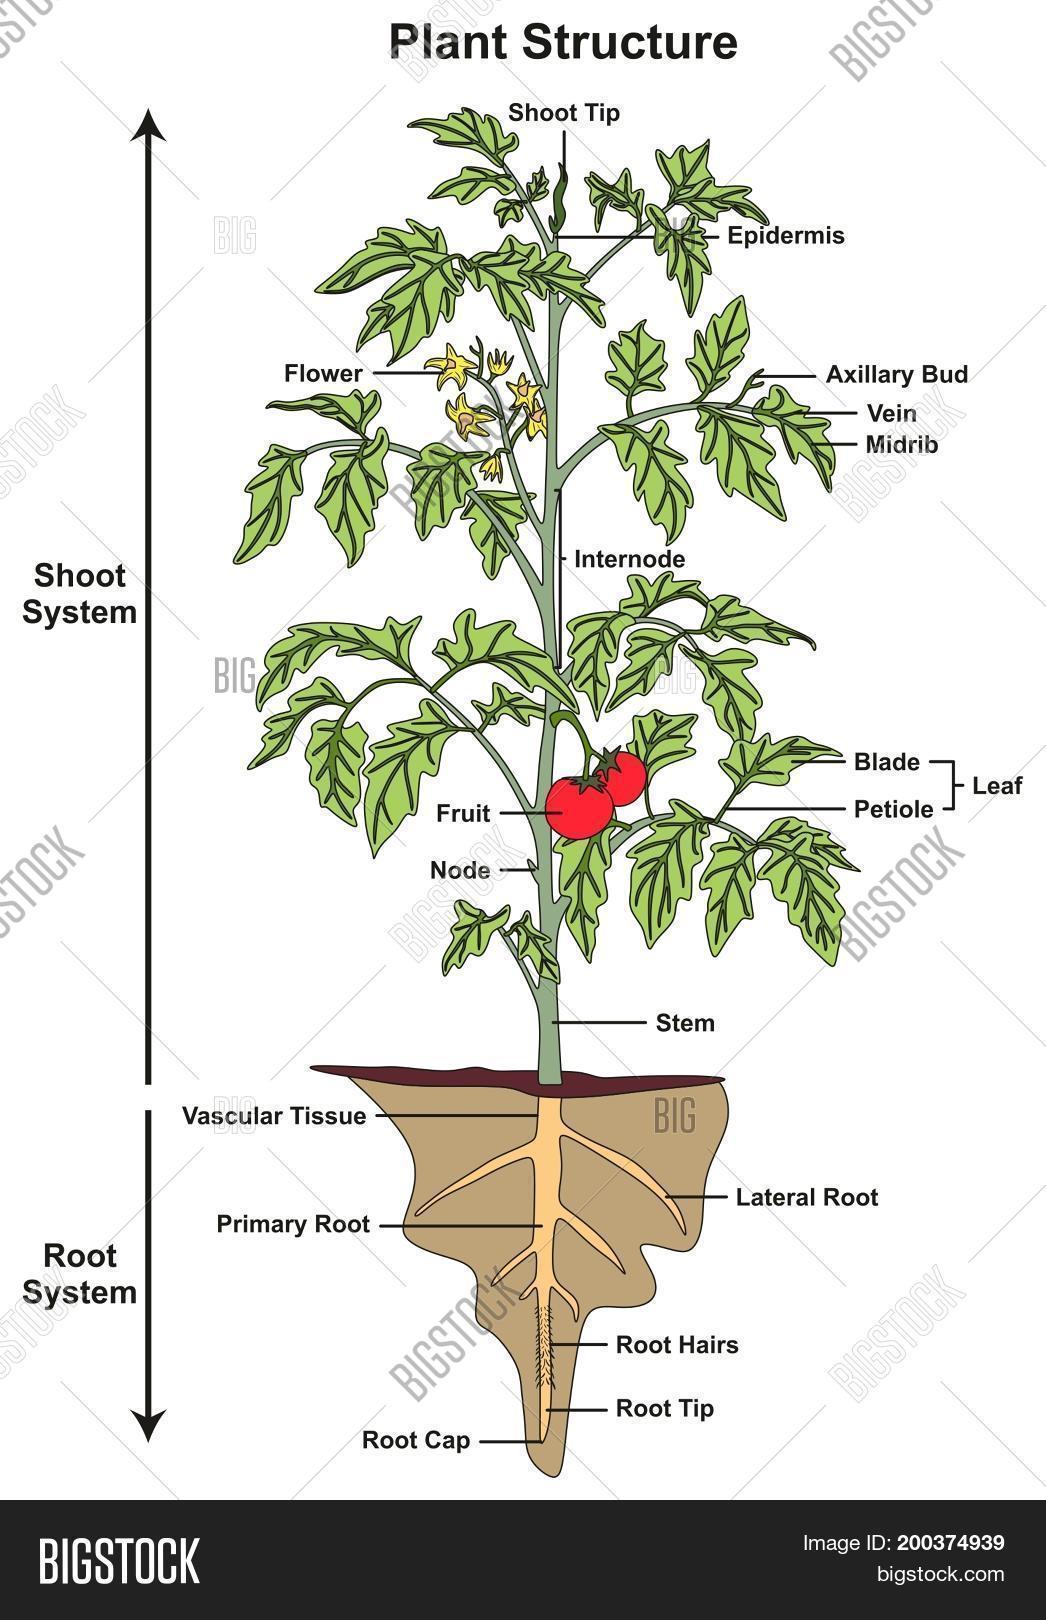 Plant Structure Infographic Diagram Image Amp Photo